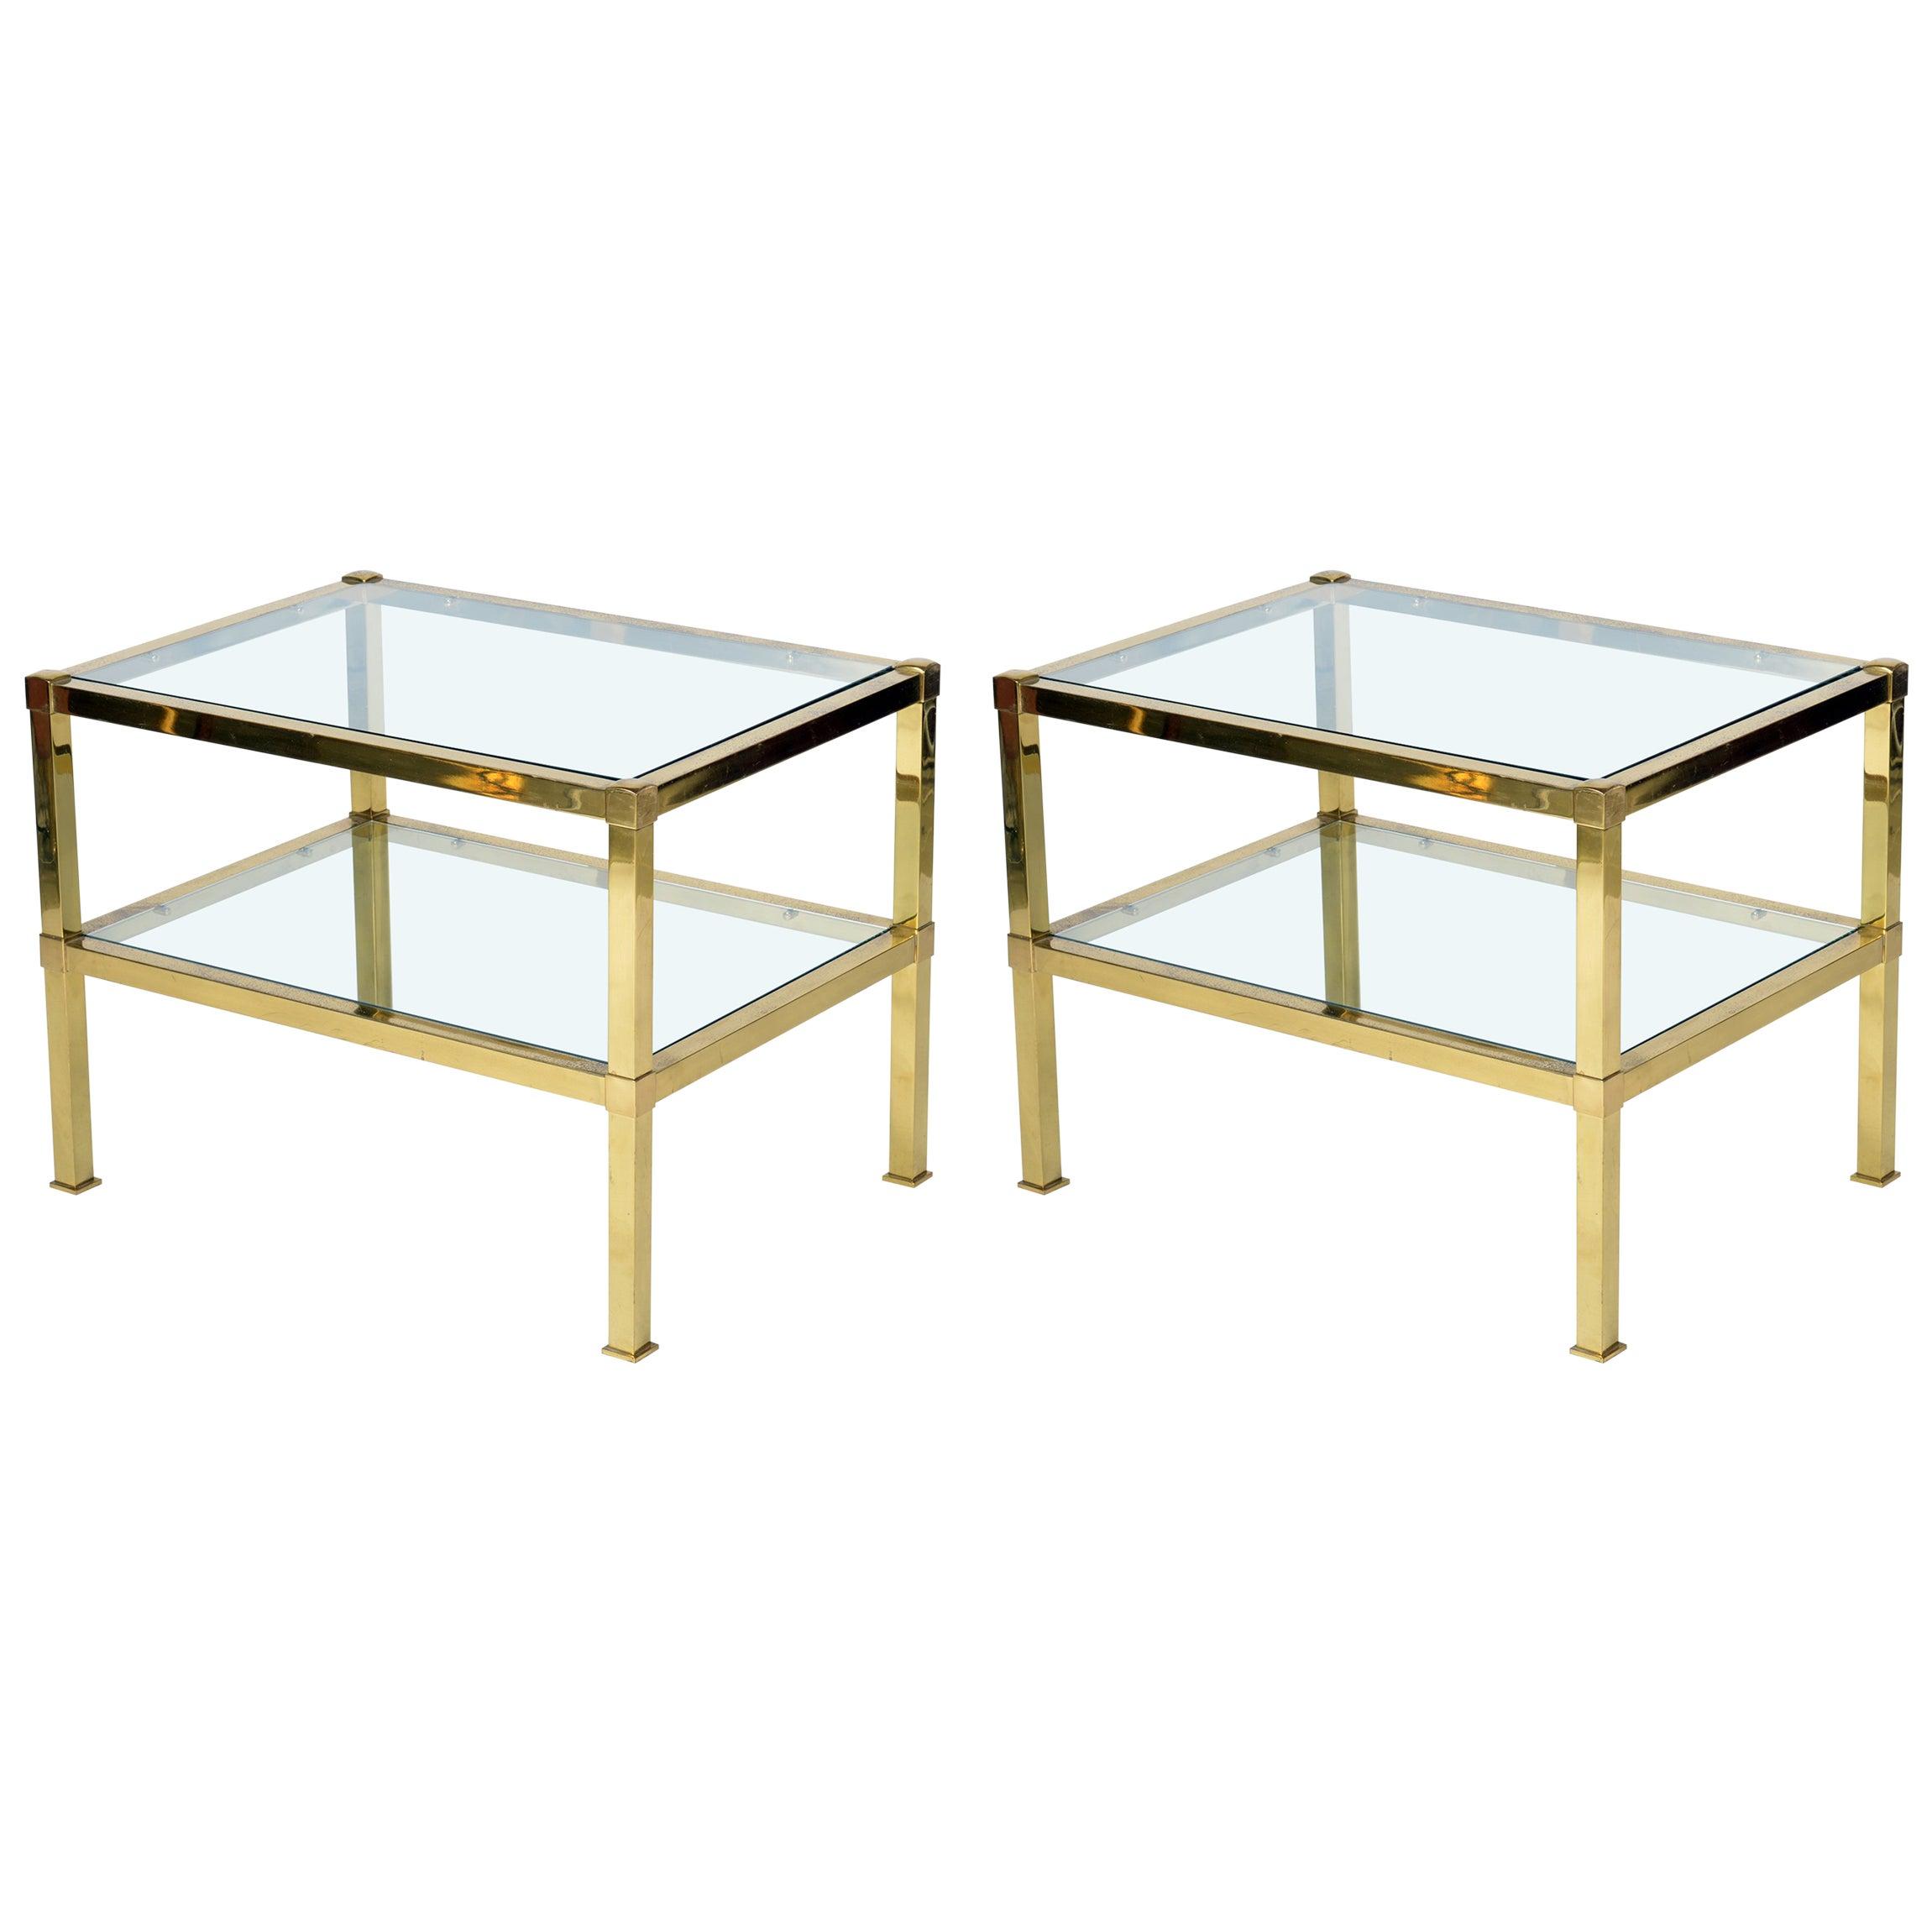 Pair of Italian  Midcentury Brass Side Table or Nightstand,1970s